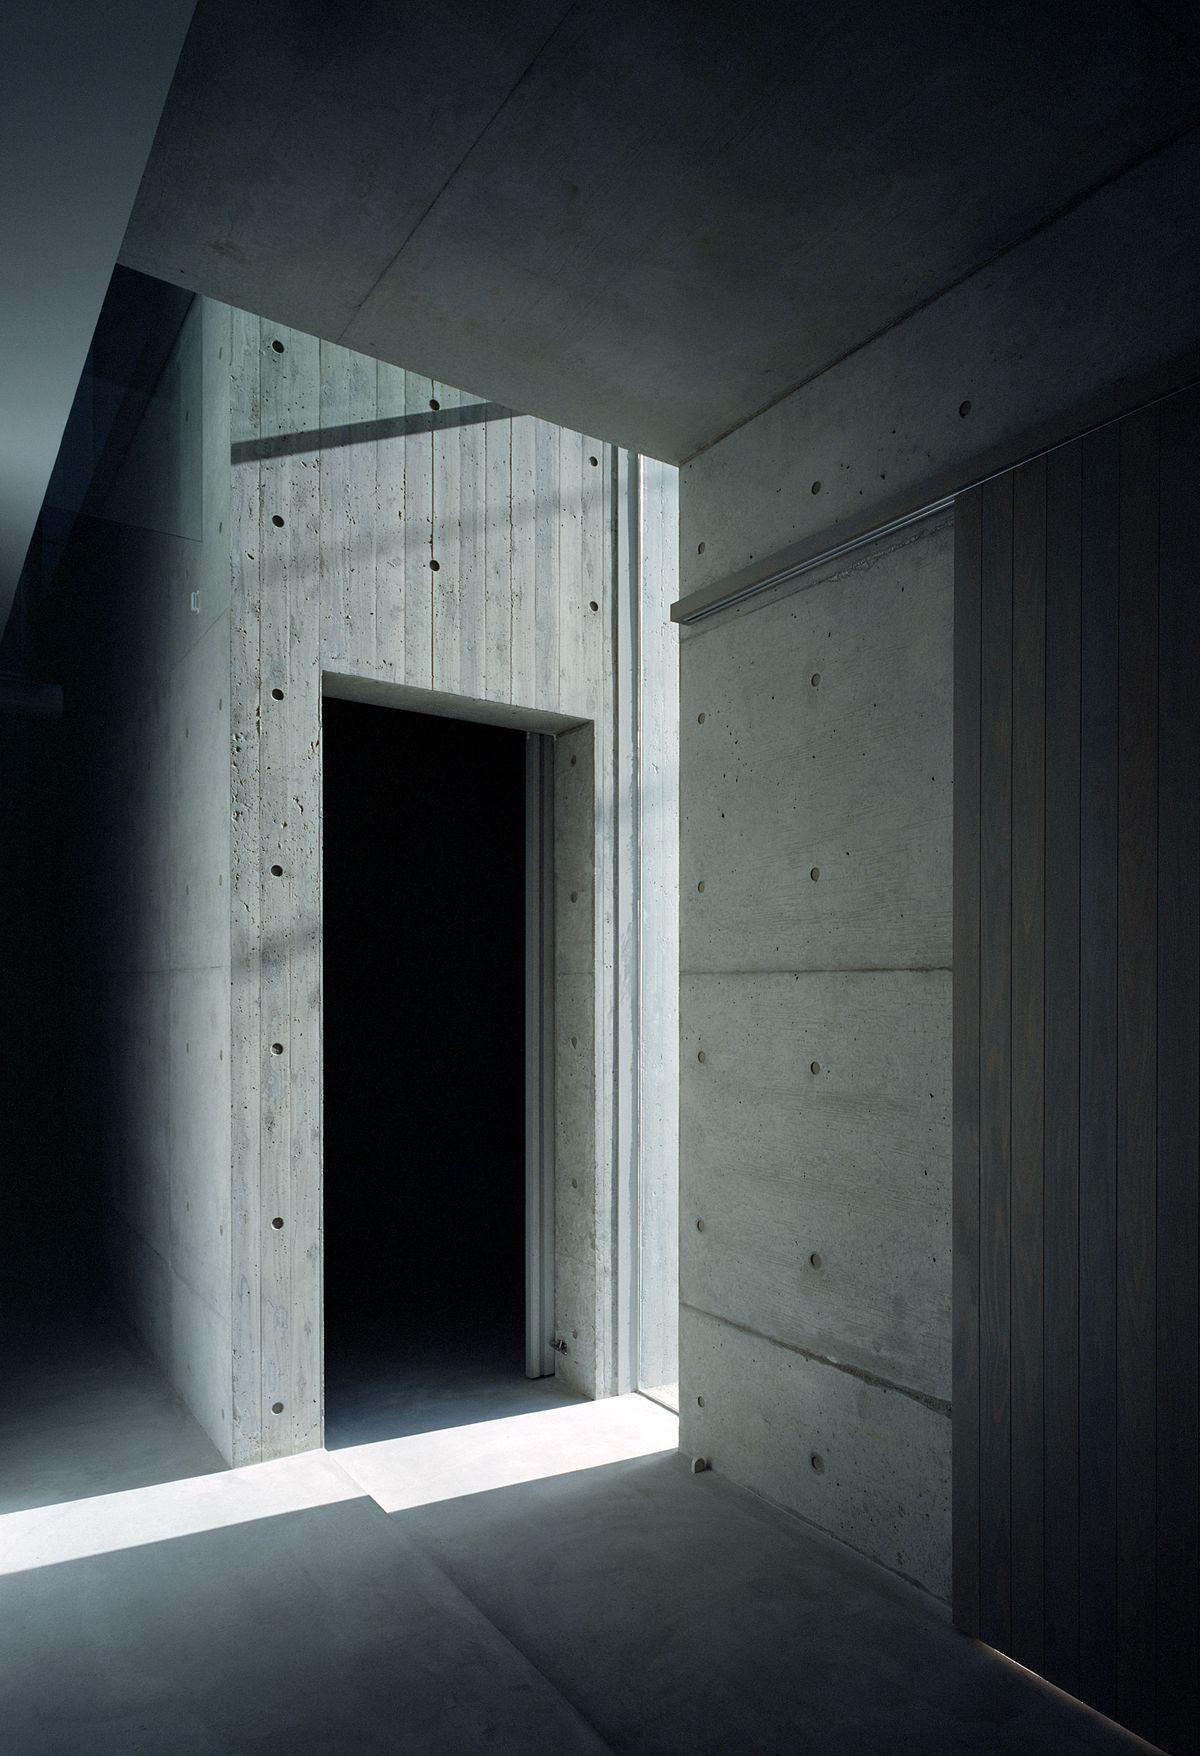 Sunlight shining onto concrete